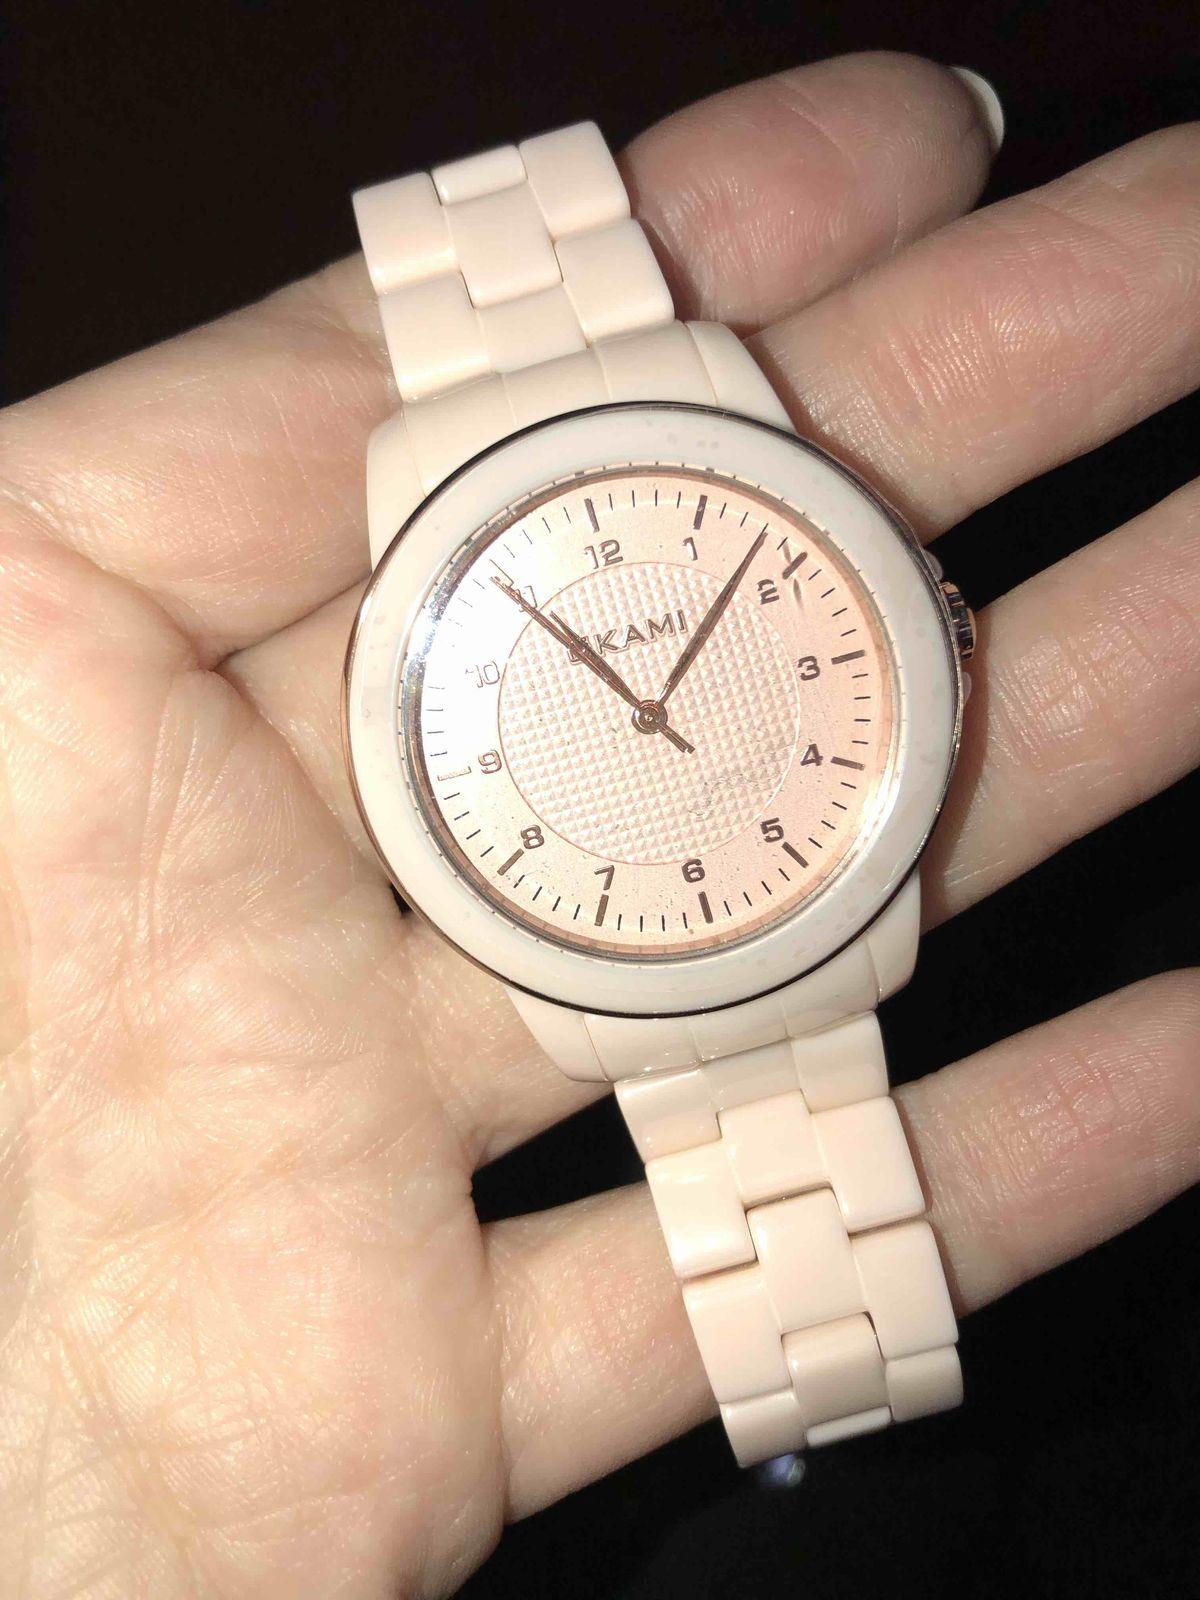 Нежнейший цвет и крутые часы